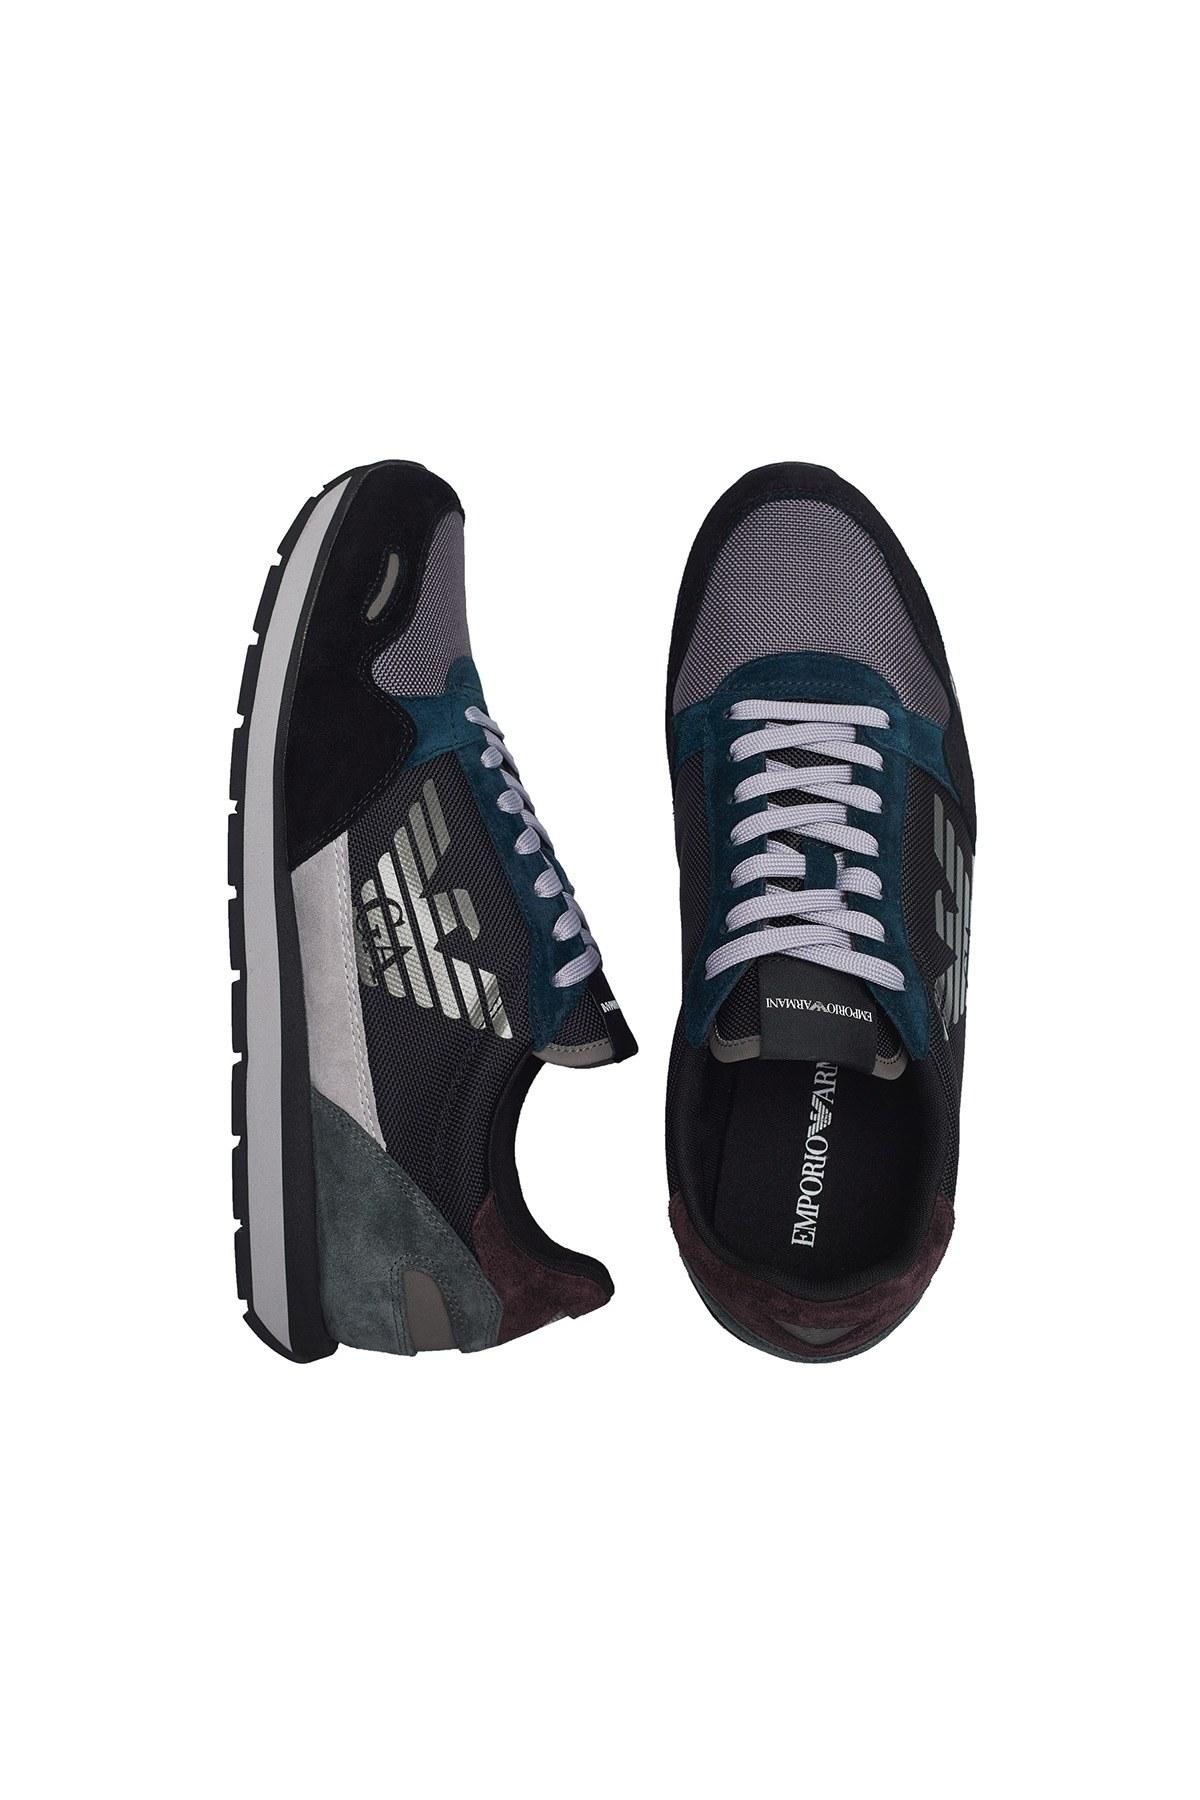 Emporio Armani Sneaker Erkek Ayakkabı X4X215 XL200 N064 SİYAH